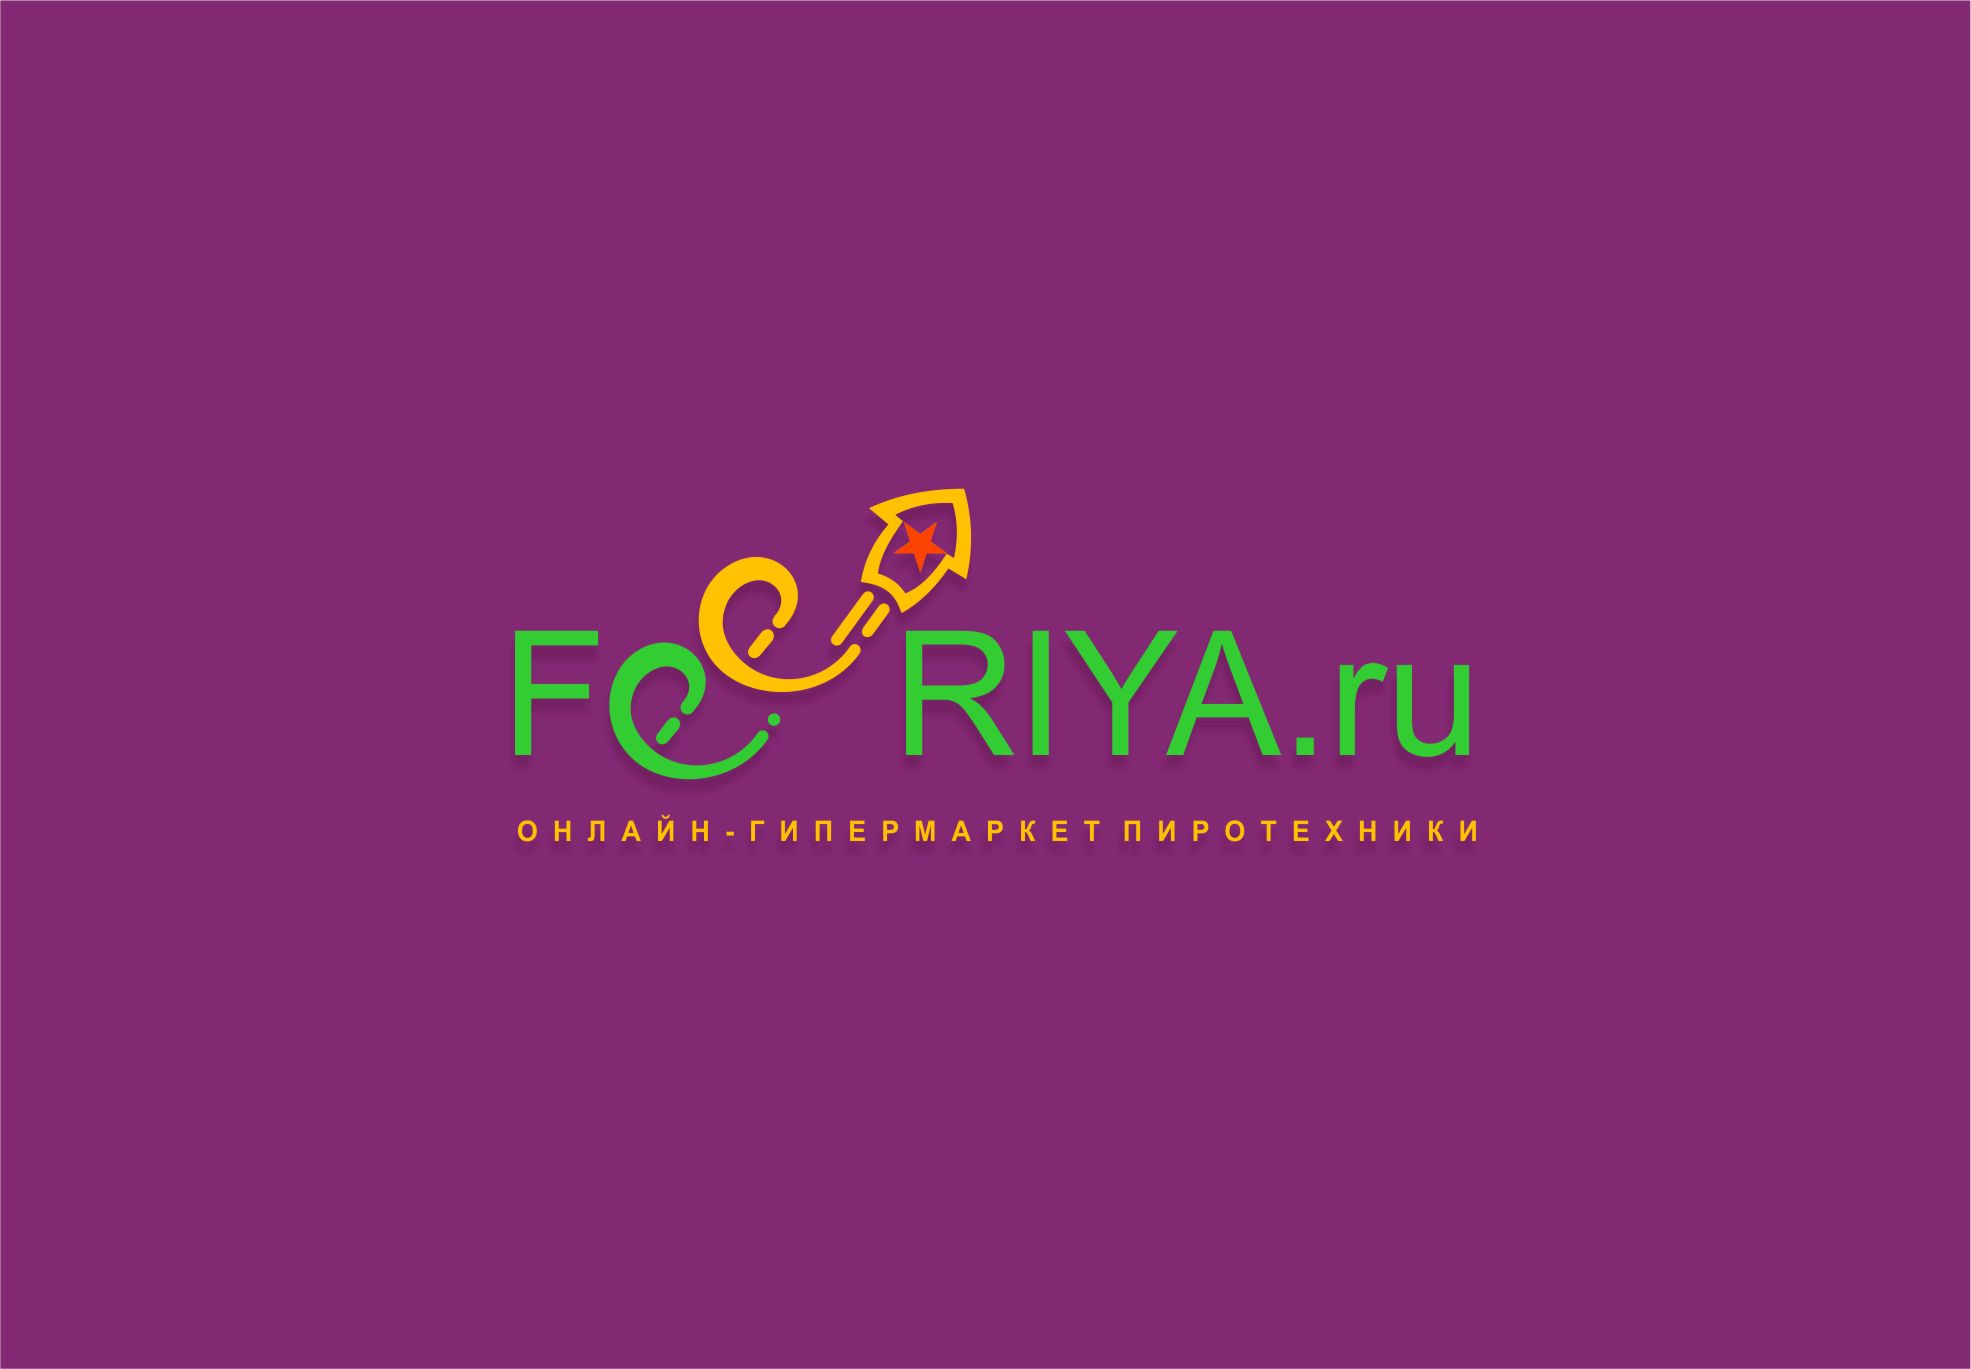 Логотип для feeriya.ru - дизайнер SobolevS21